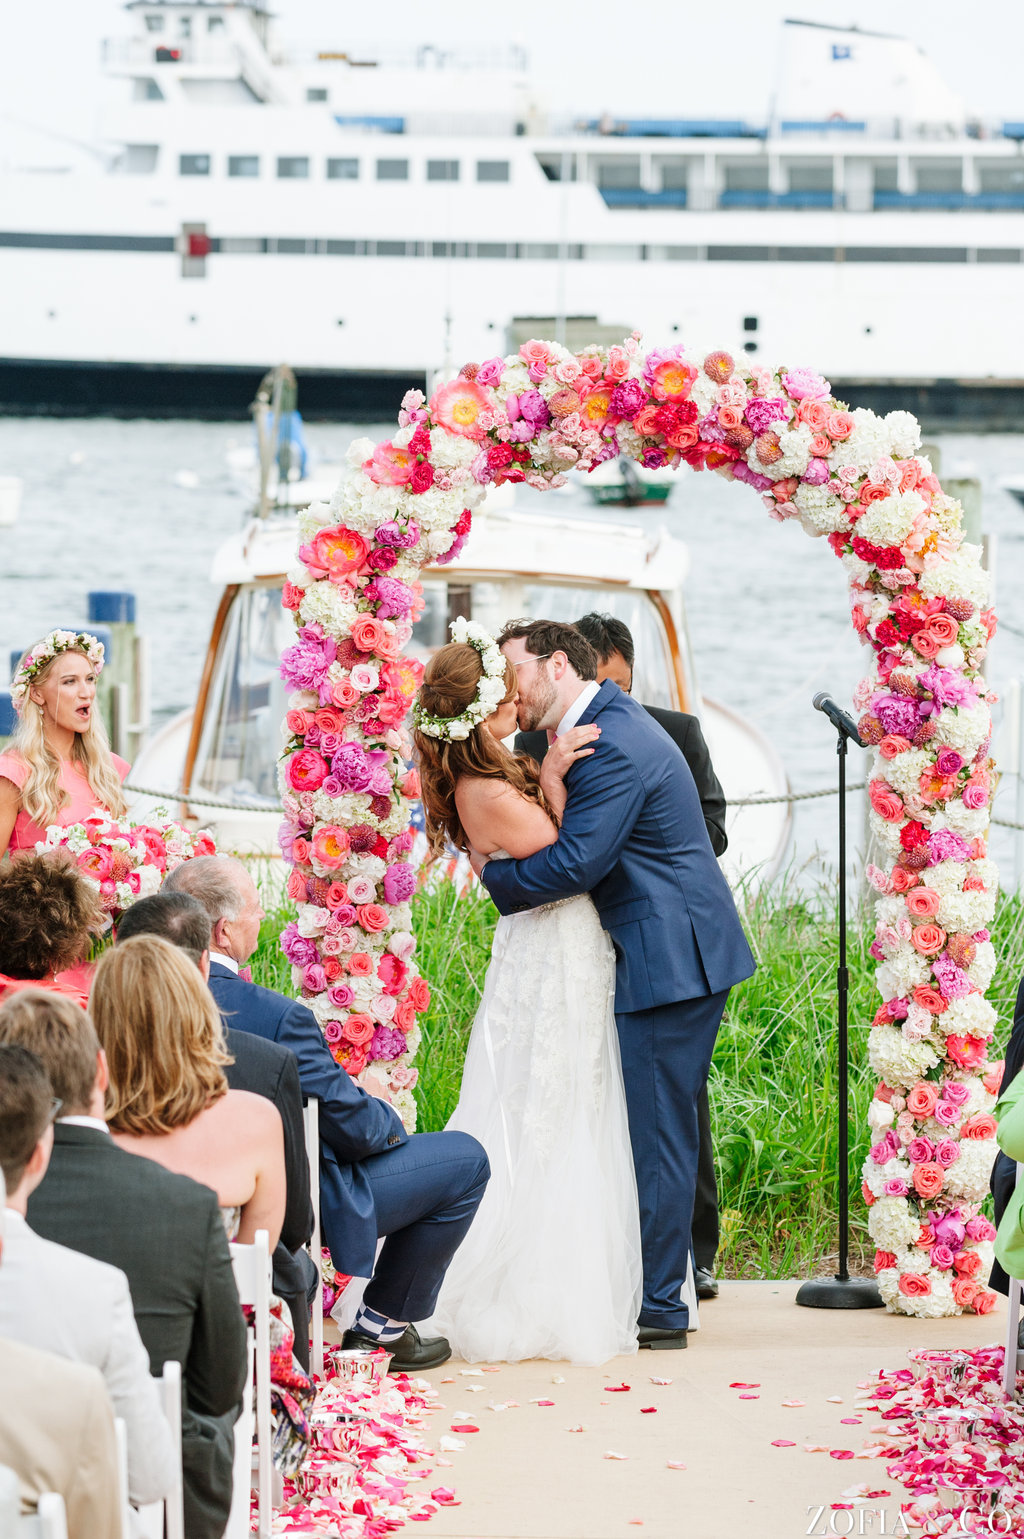 Ceci_New_York_Style_Luxury_Custom_Summer_Wedding_CeciBride_Nautical_Blue_Gold_Letterpress_Foil_65.jpg